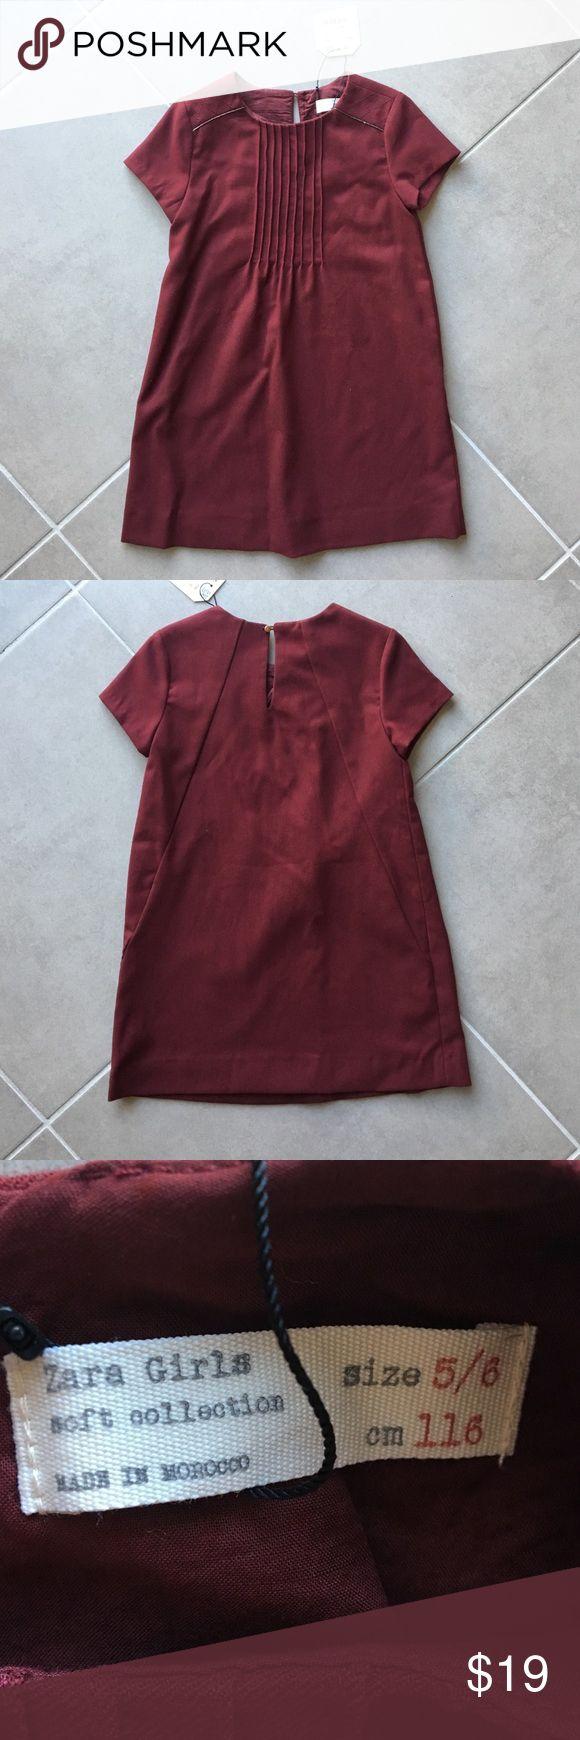 Zara Girls dress Dark red dress, never worn, tags attached. Zara Dresses